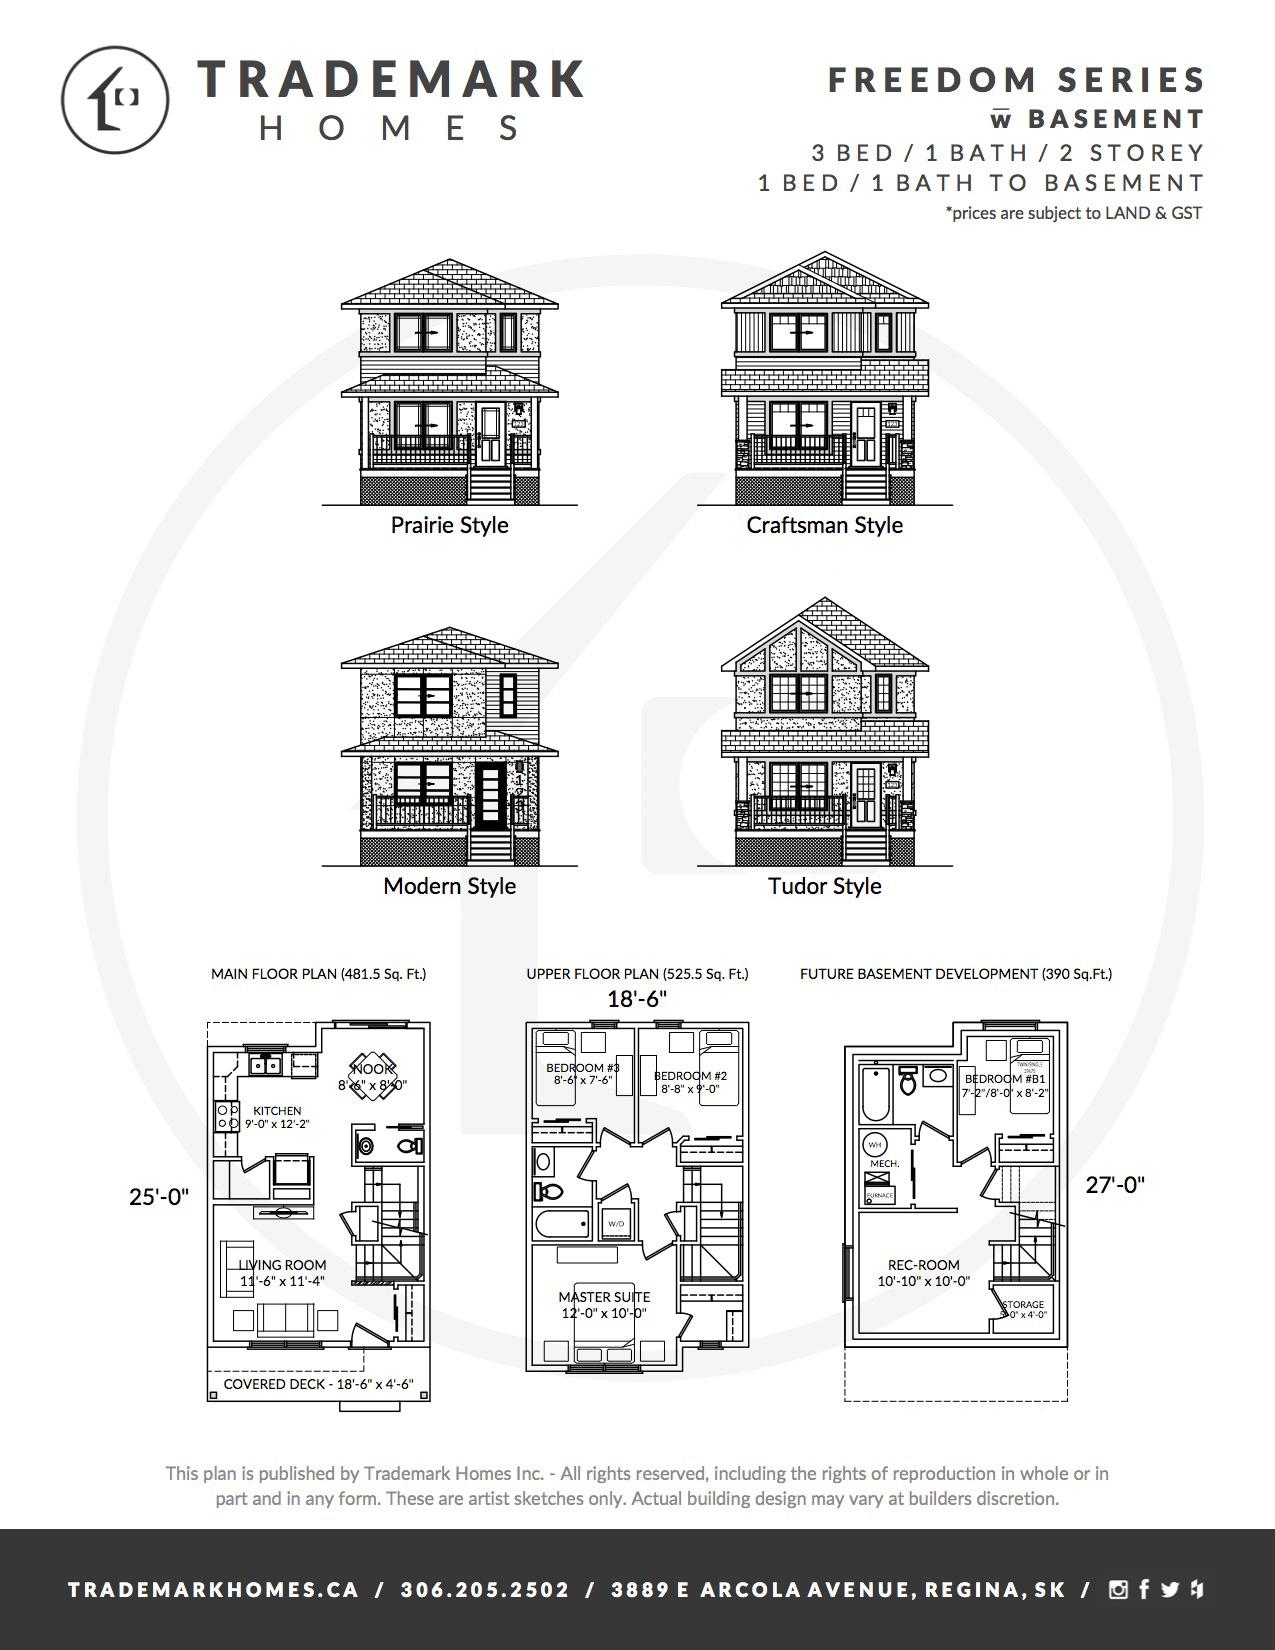 Freedom Series - 2 Storey - with basement - Floorplan - Regina Home Builder